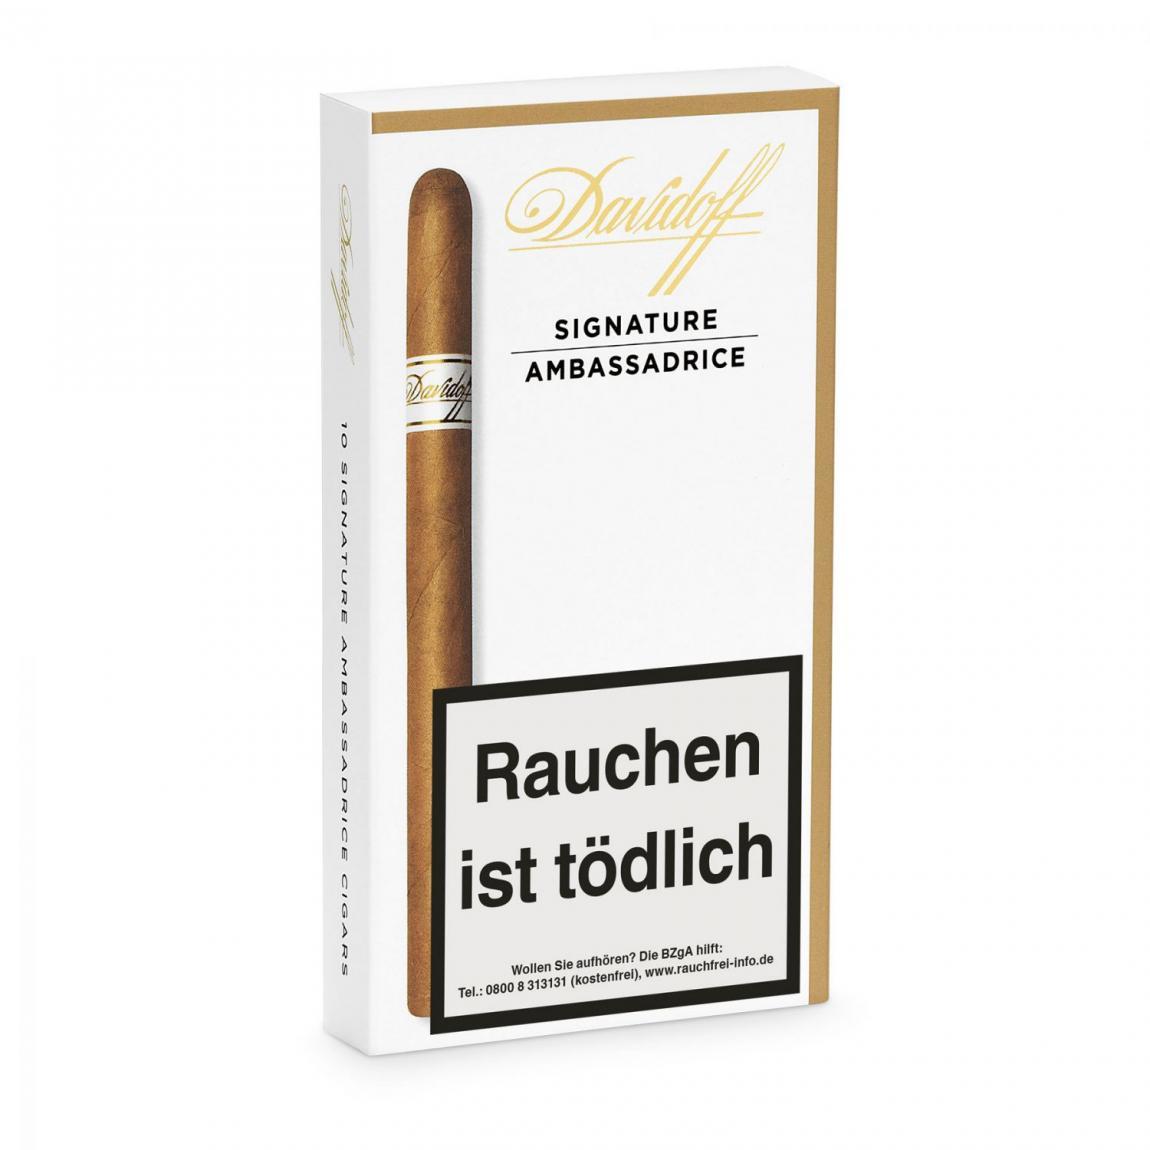 Davidoff »Signature« Ambassadrice, 10er Schachtel